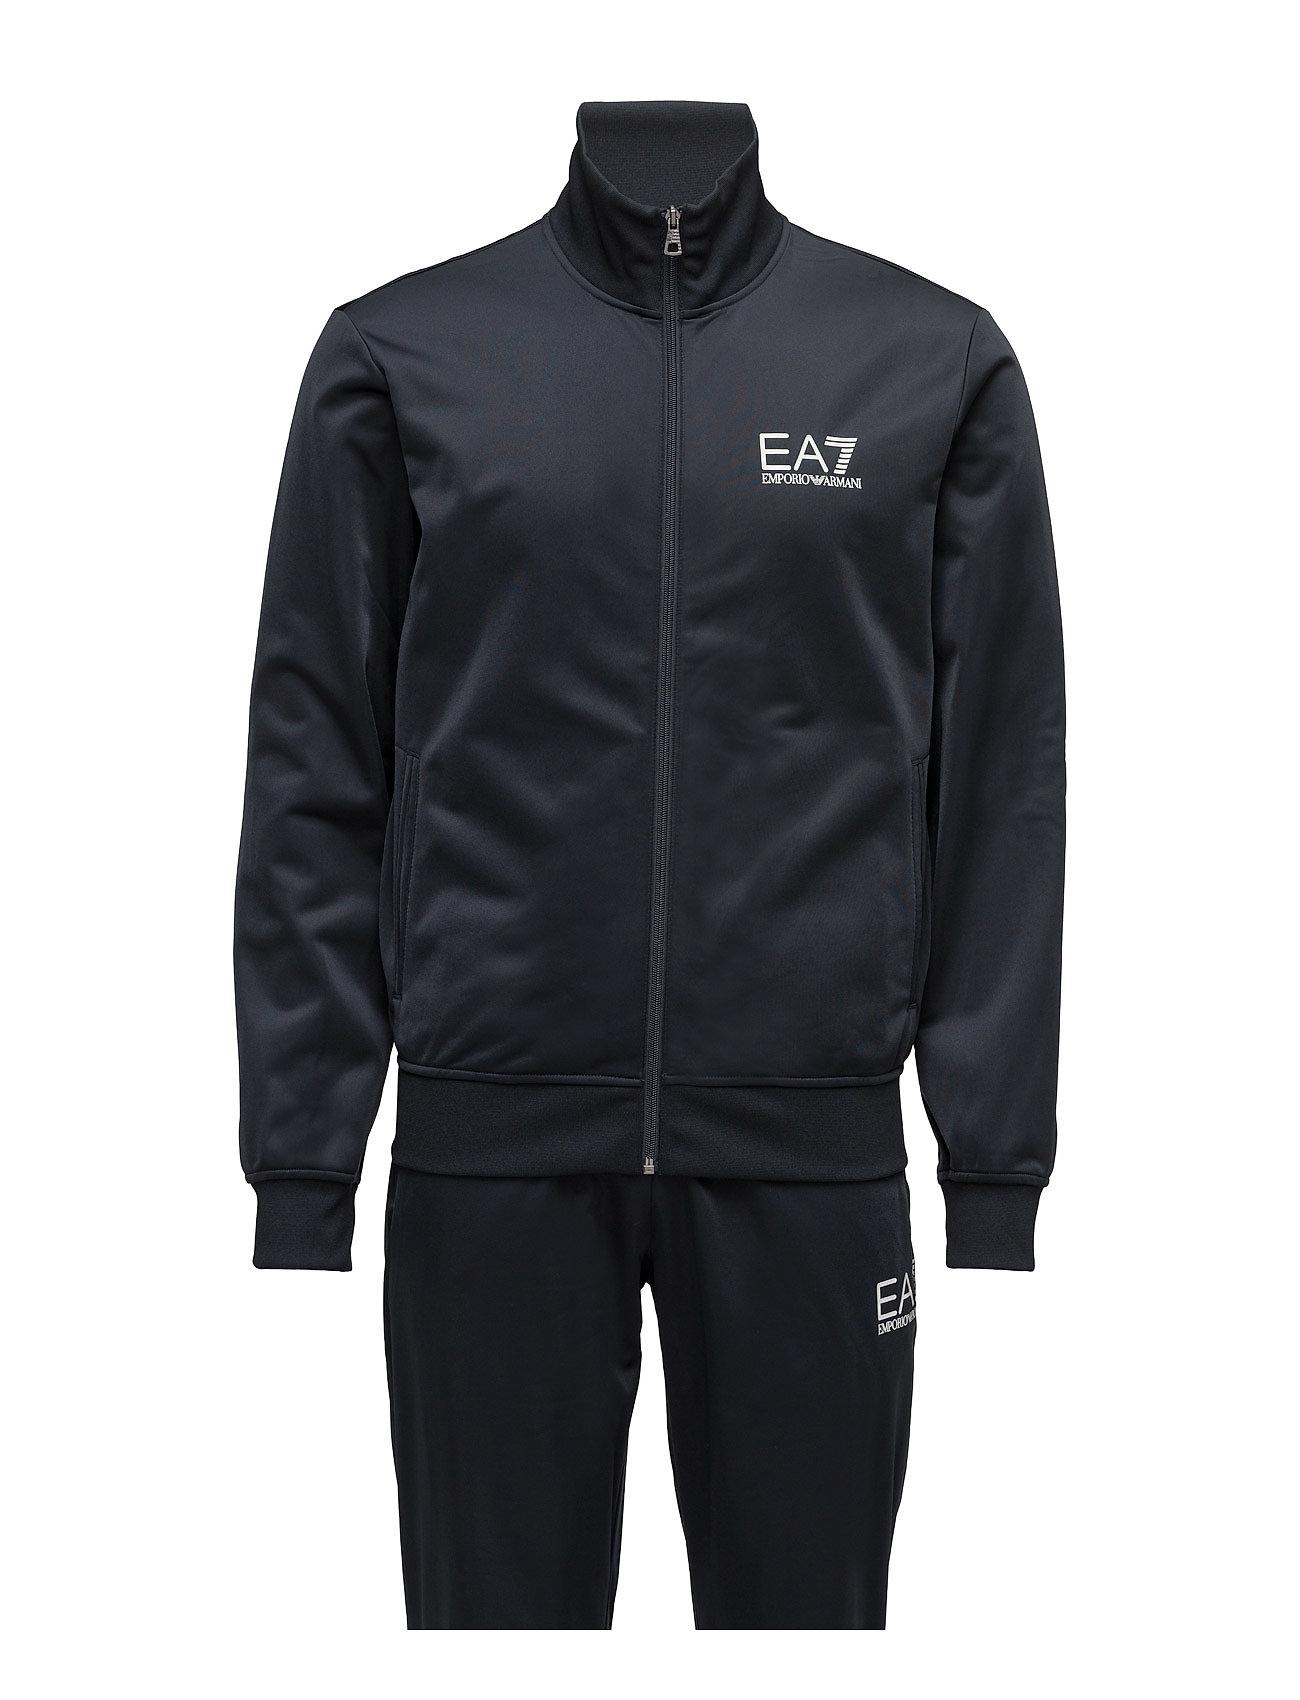 ea7 – Tuta sportiva fra boozt.com dk